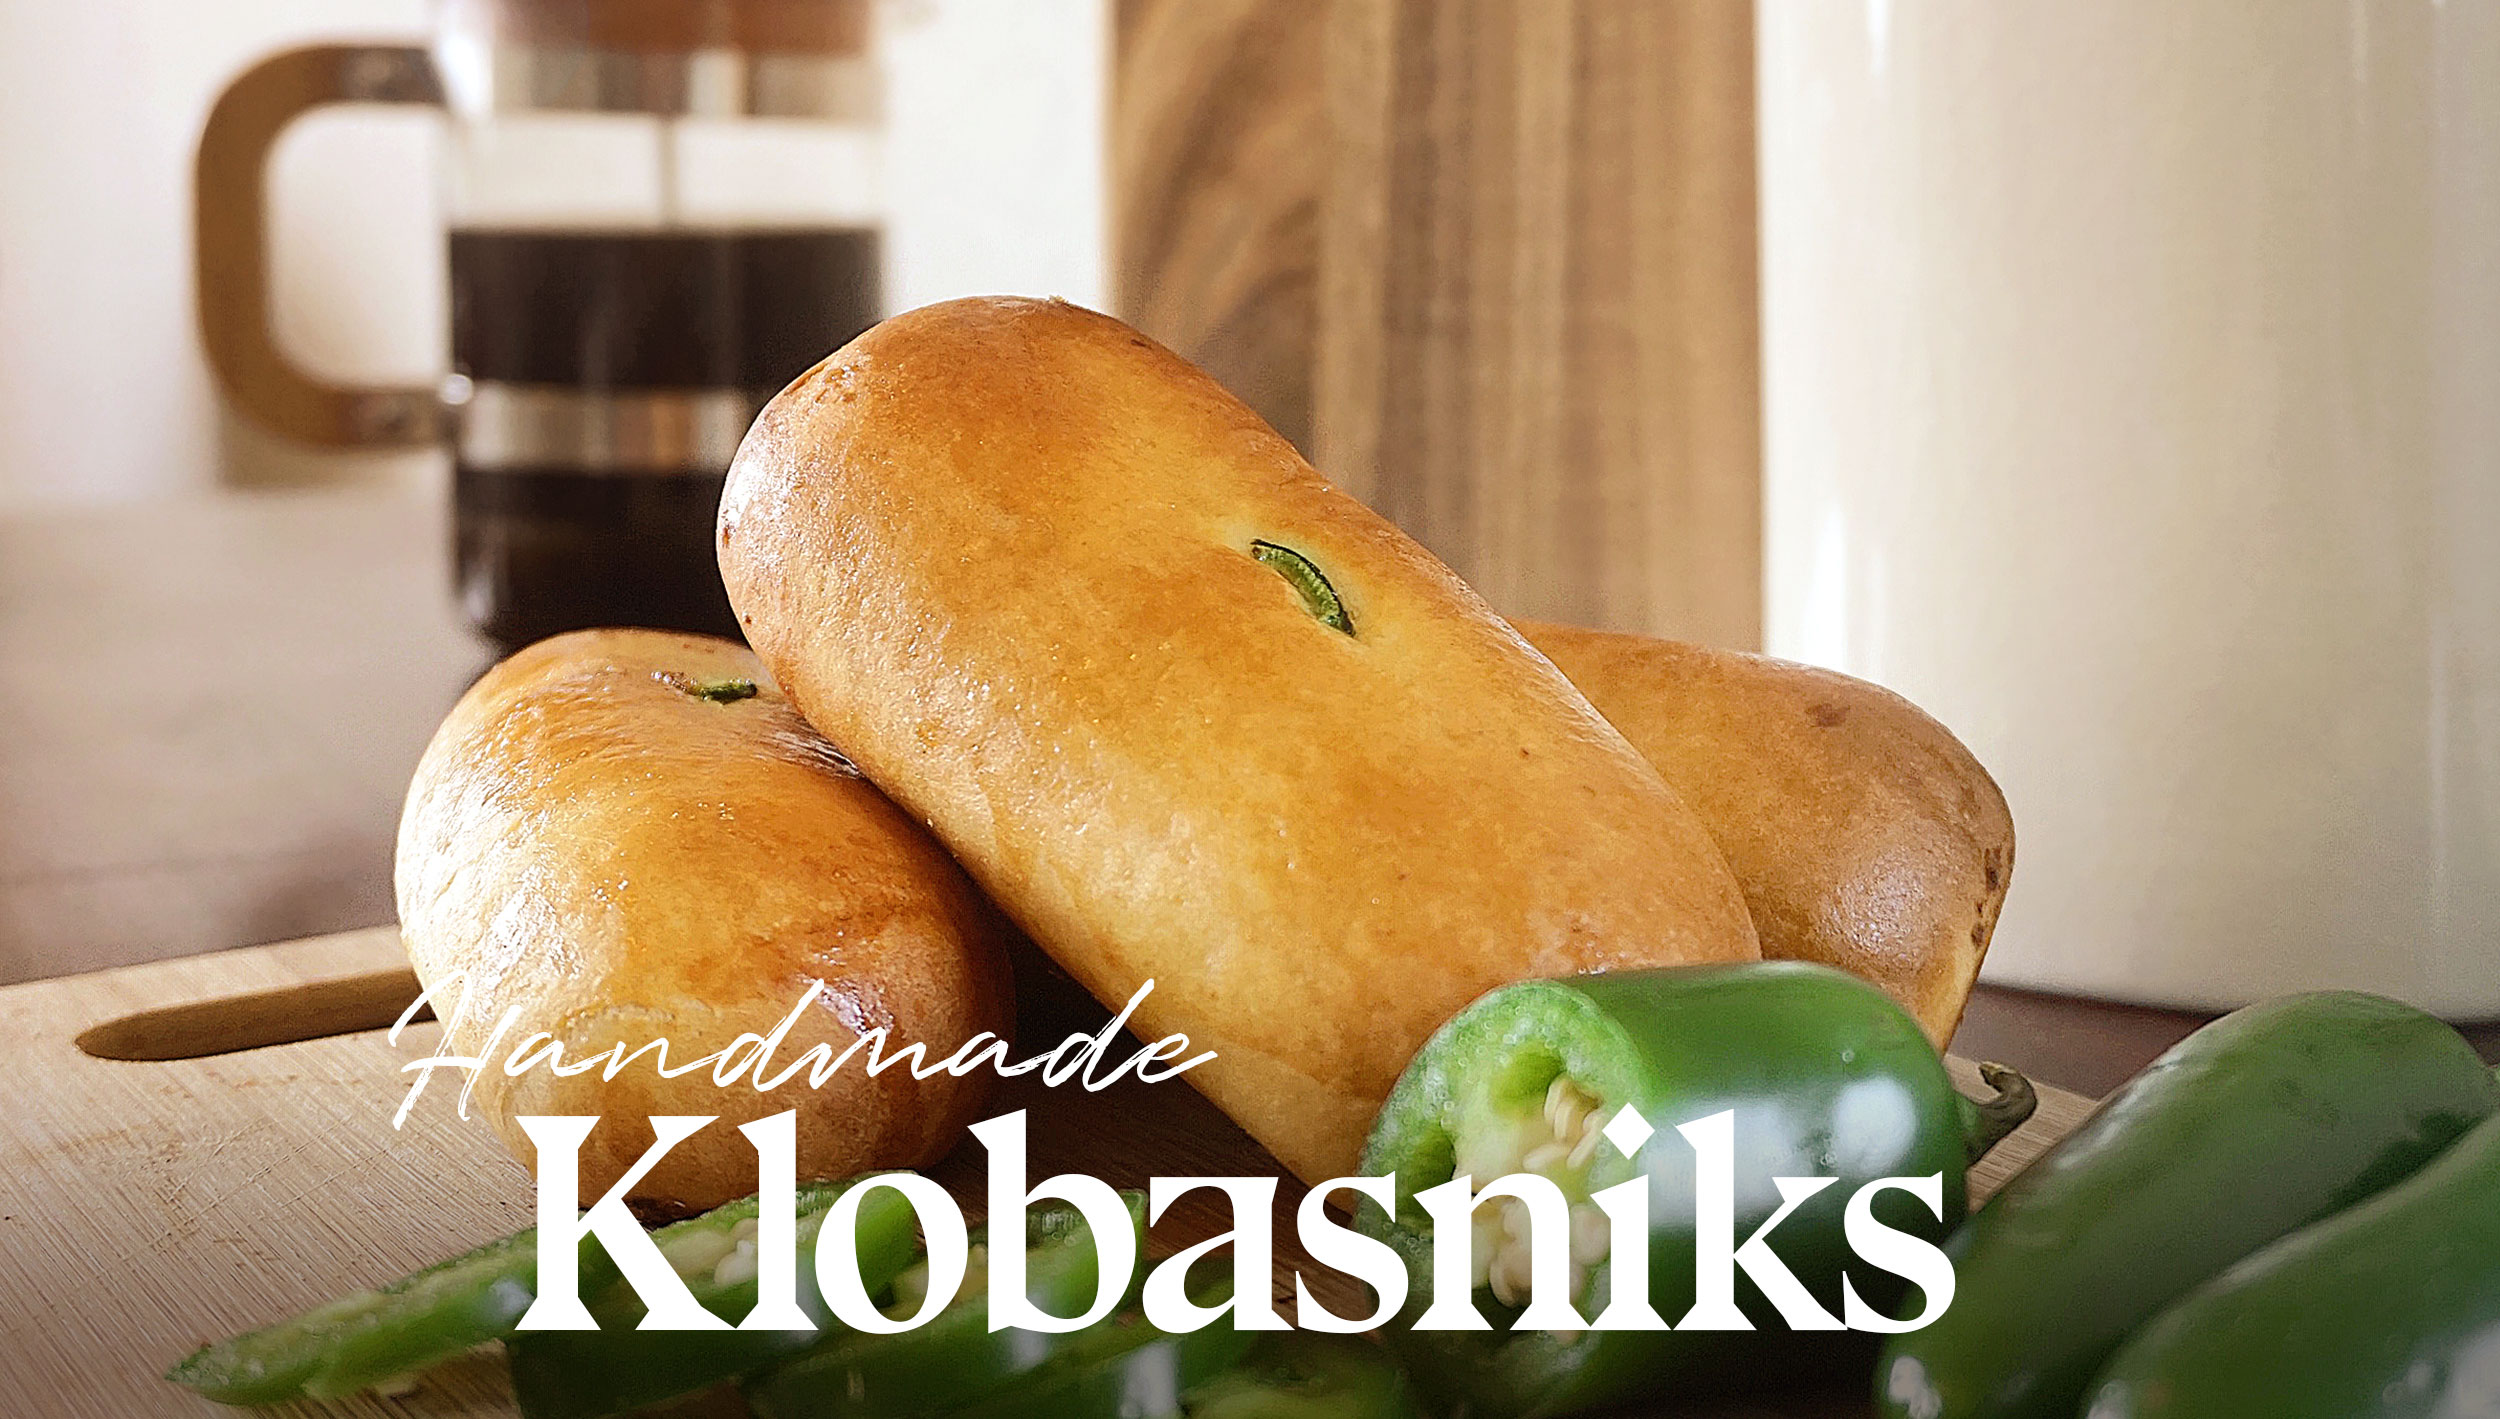 4CB_klobasniks.jpg